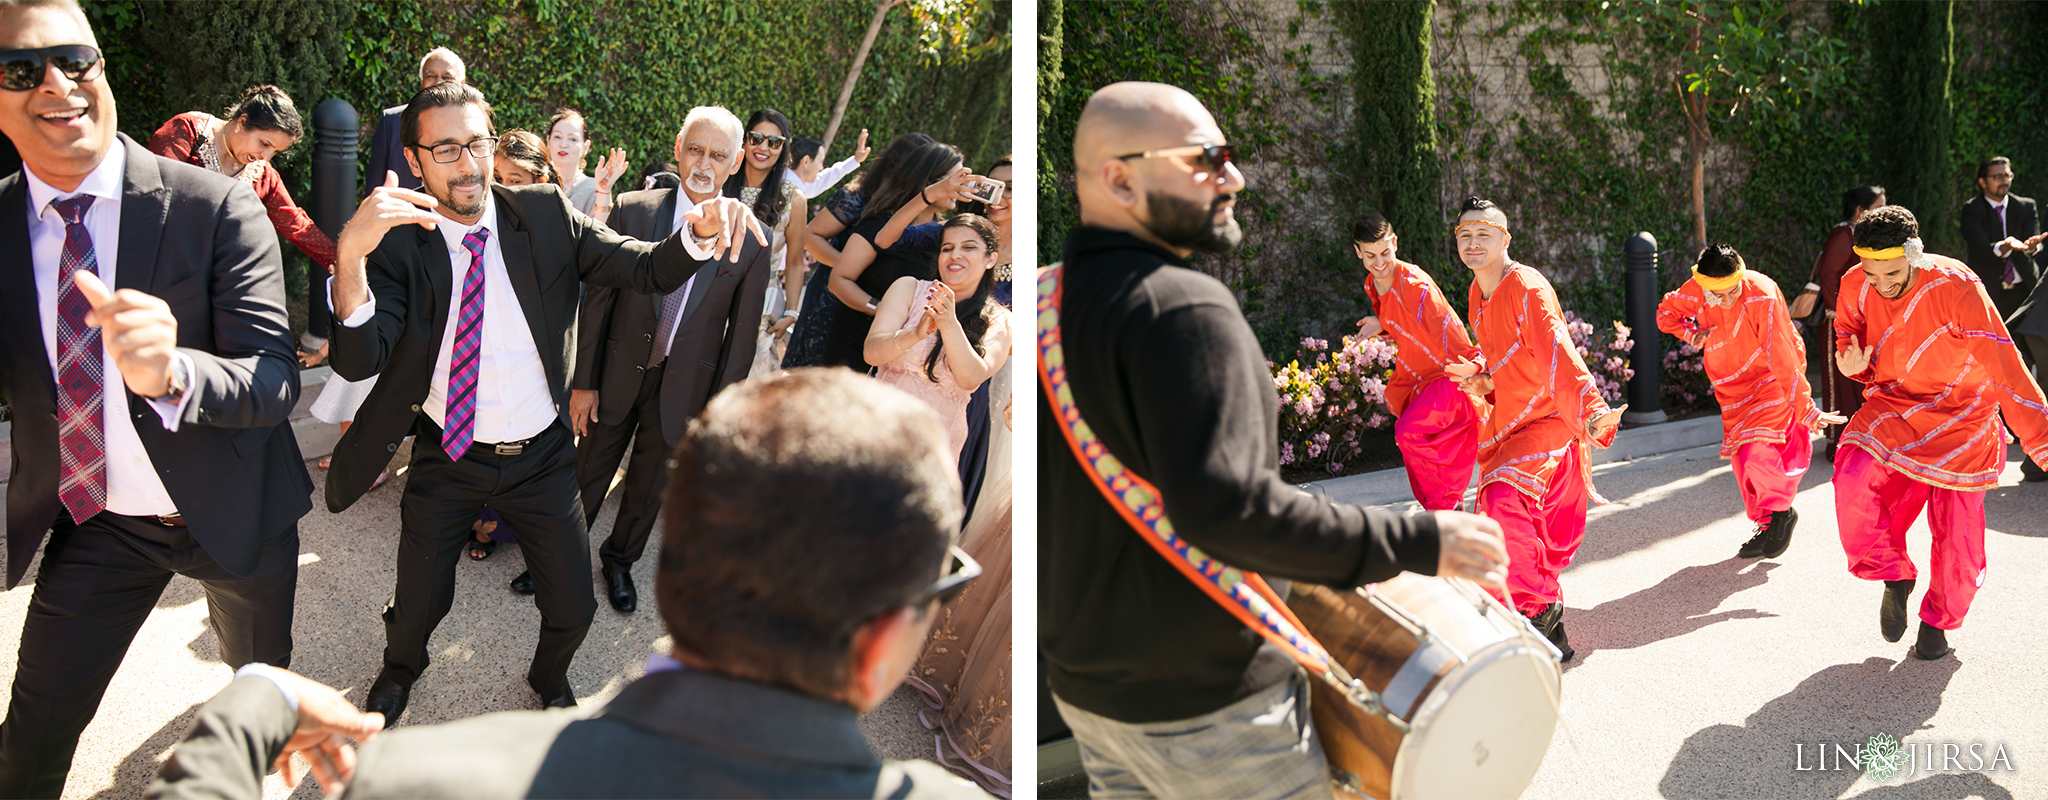 15 Four Seasons Westlake Village Indian Wedding Photographer